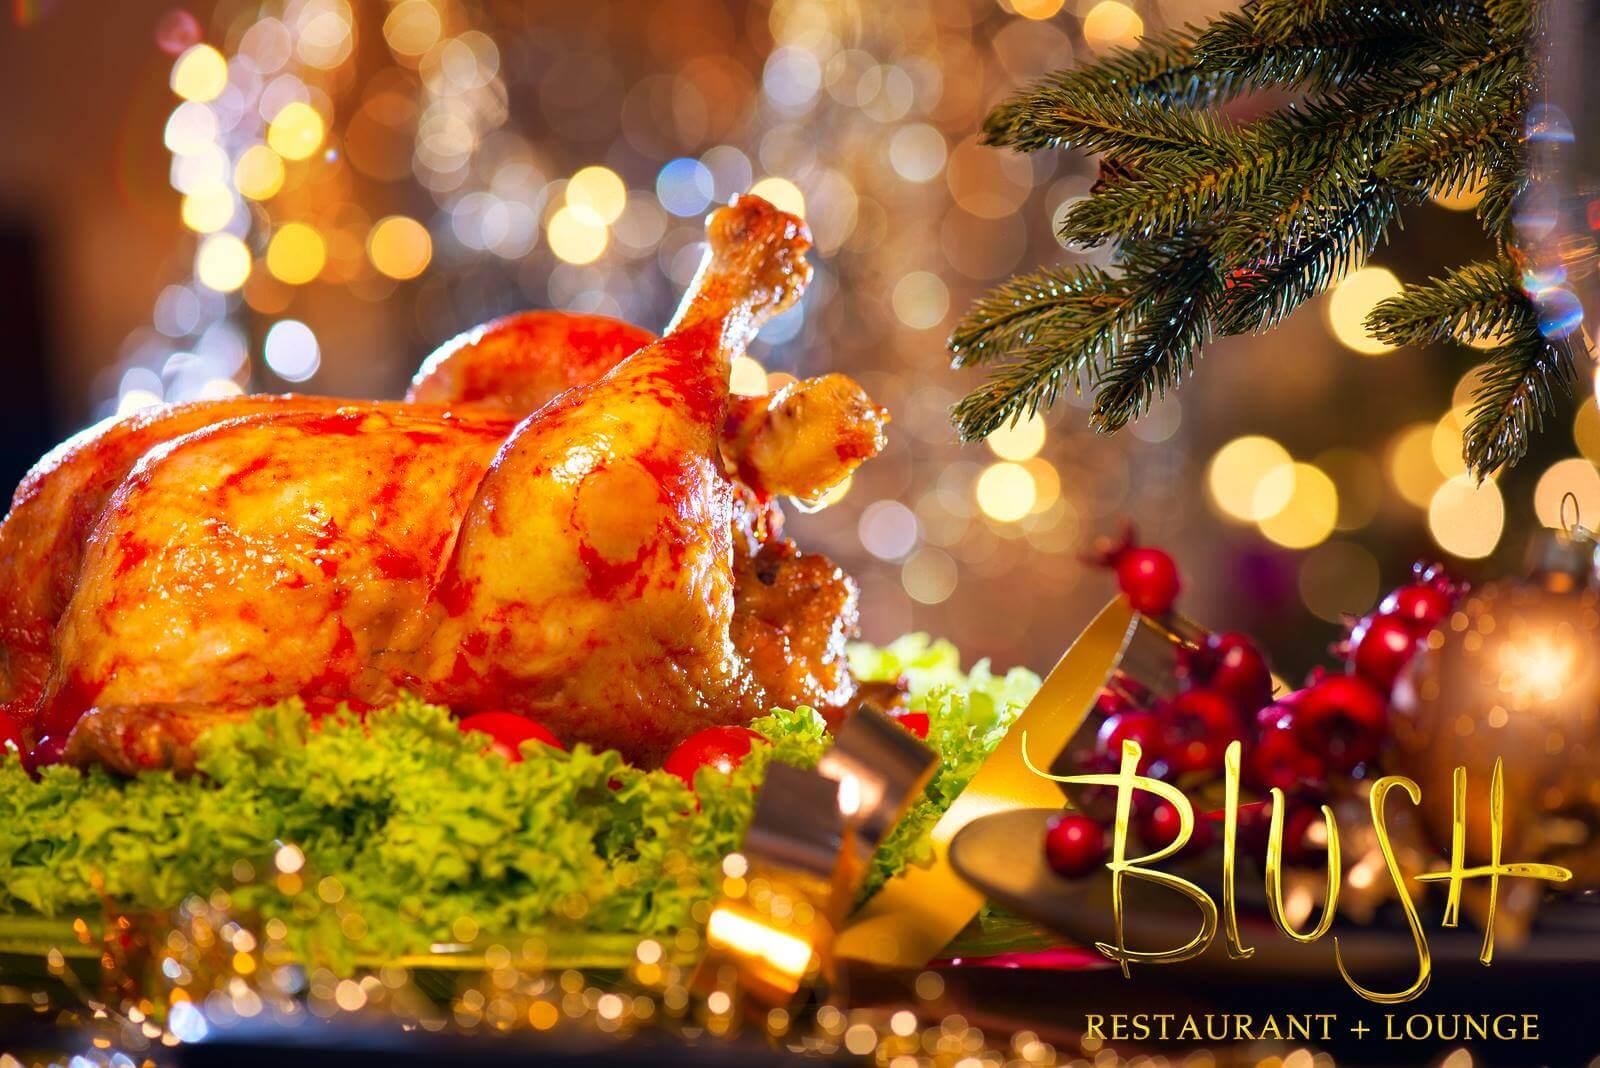 Christmas Dinner in Santa Barbara is best at Blush